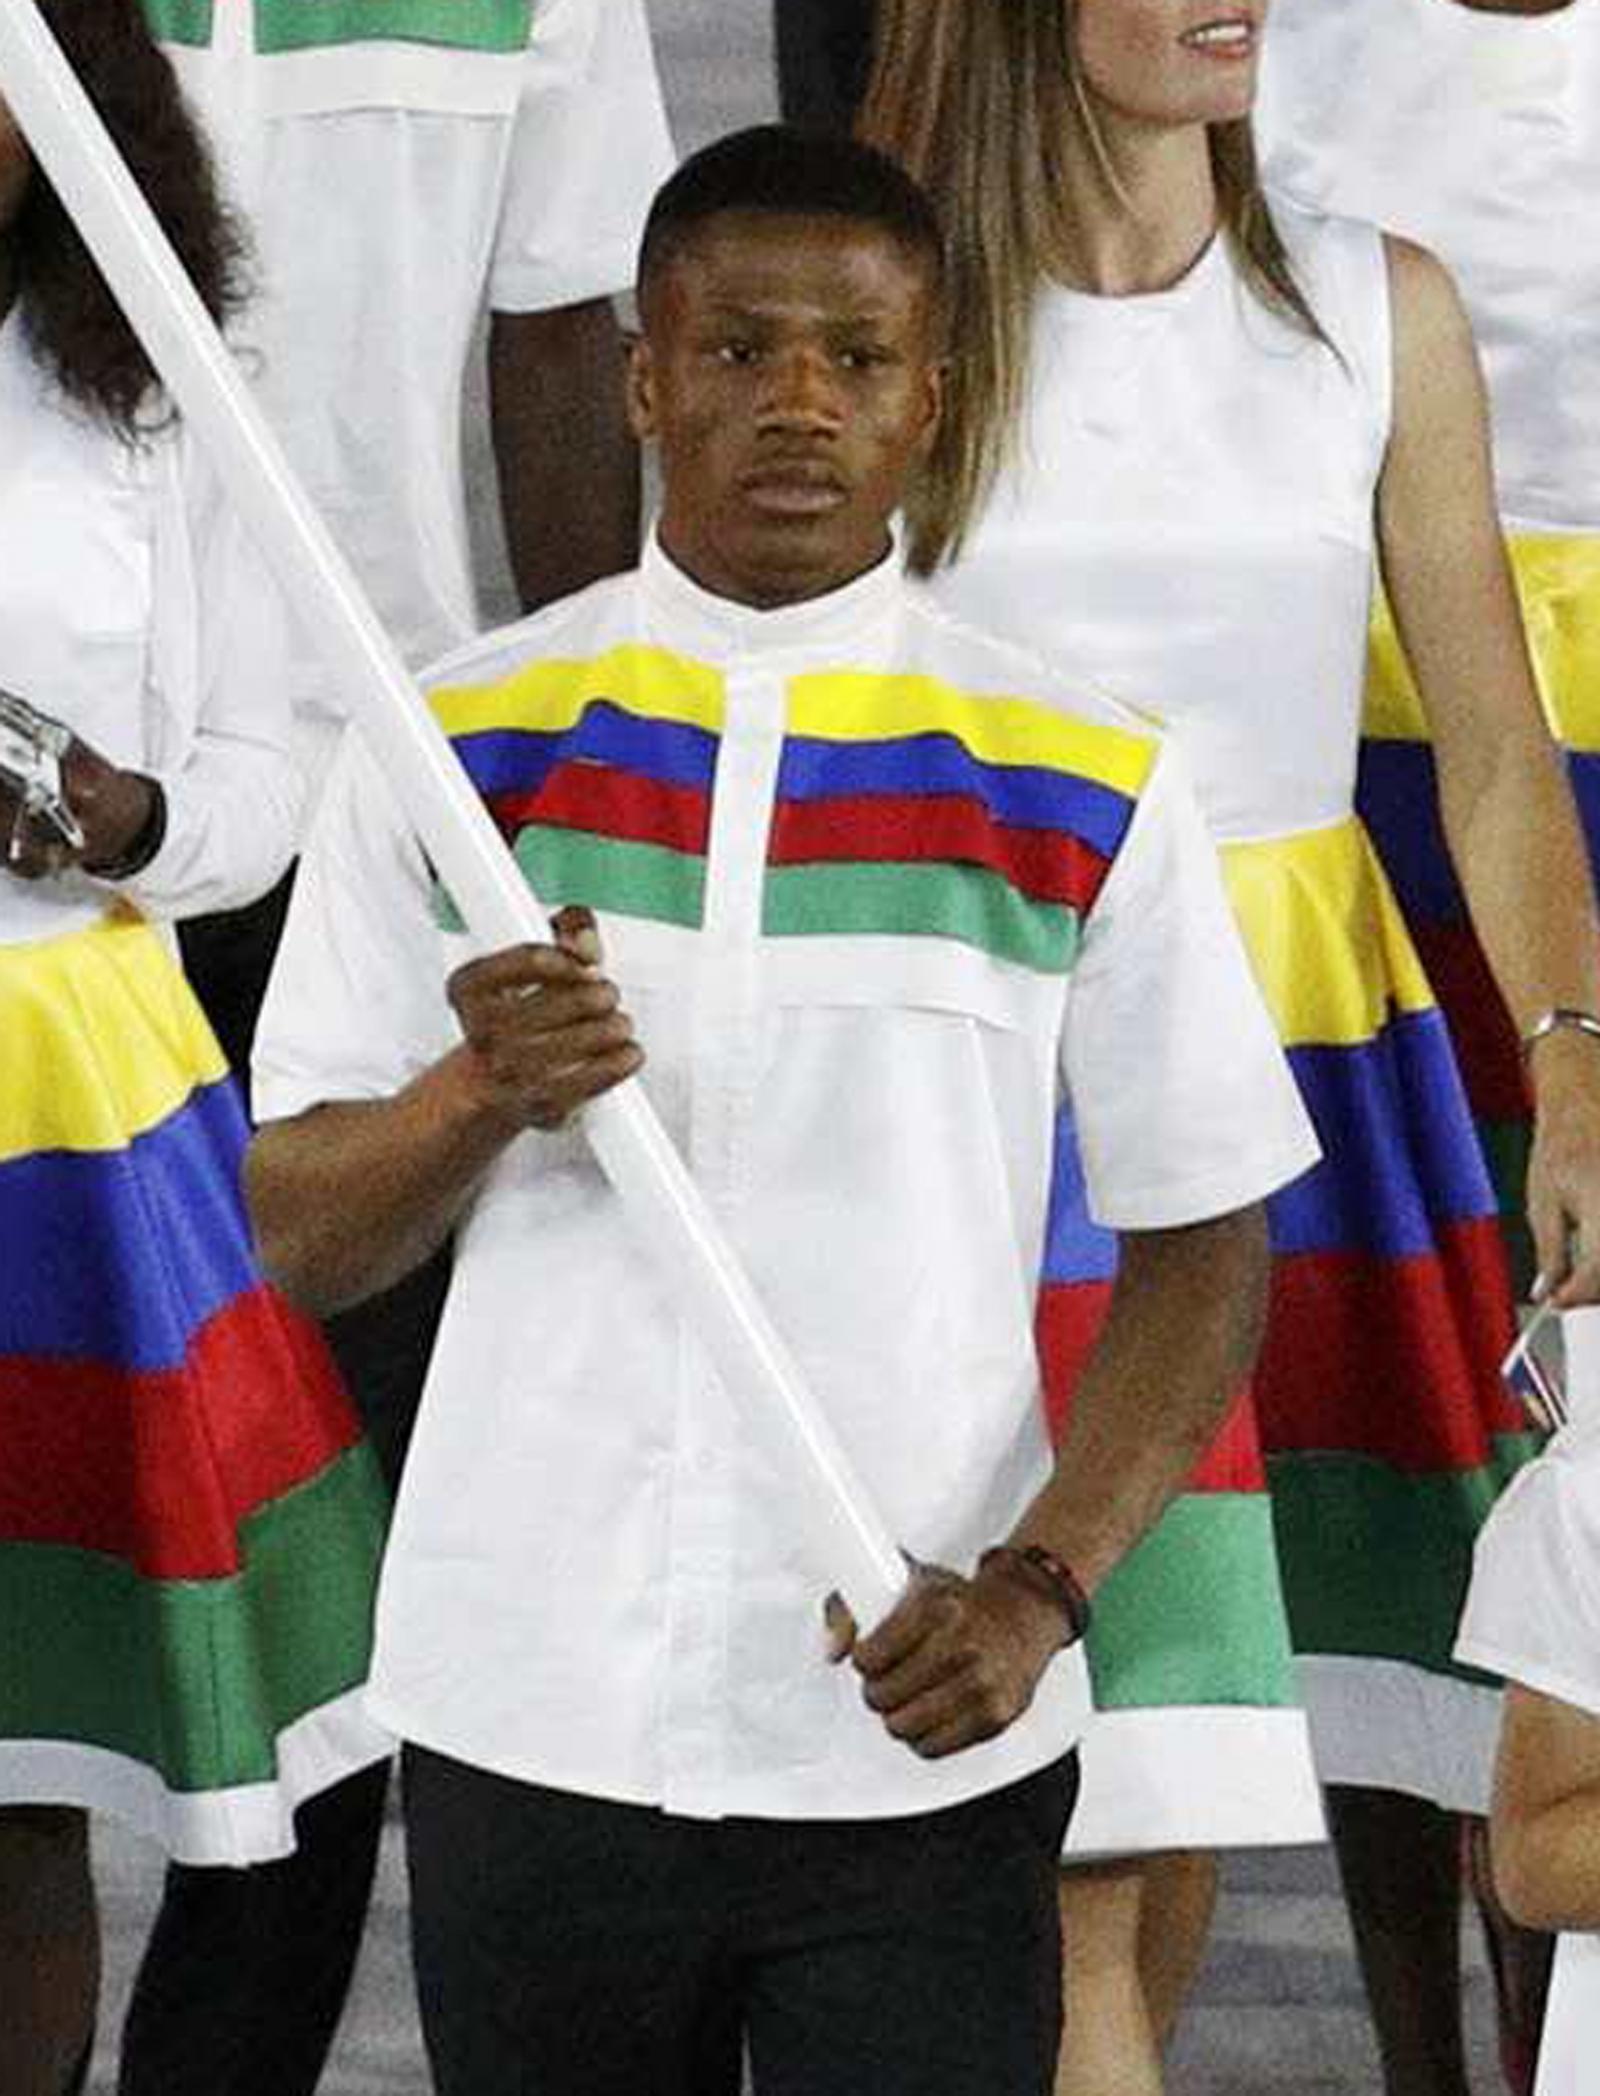 Namibian boxer Jonas Junius